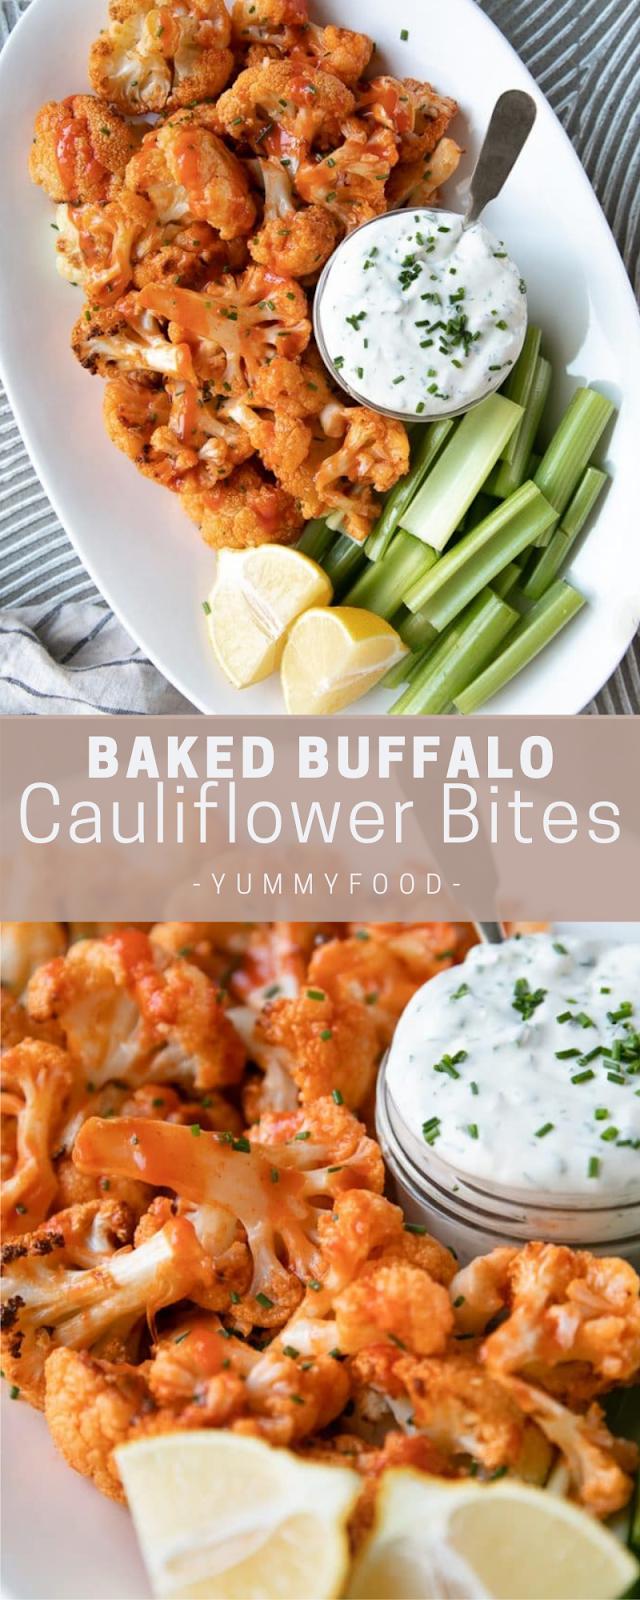 Bаkеd Buffalo Cаulіflоwеr Bites